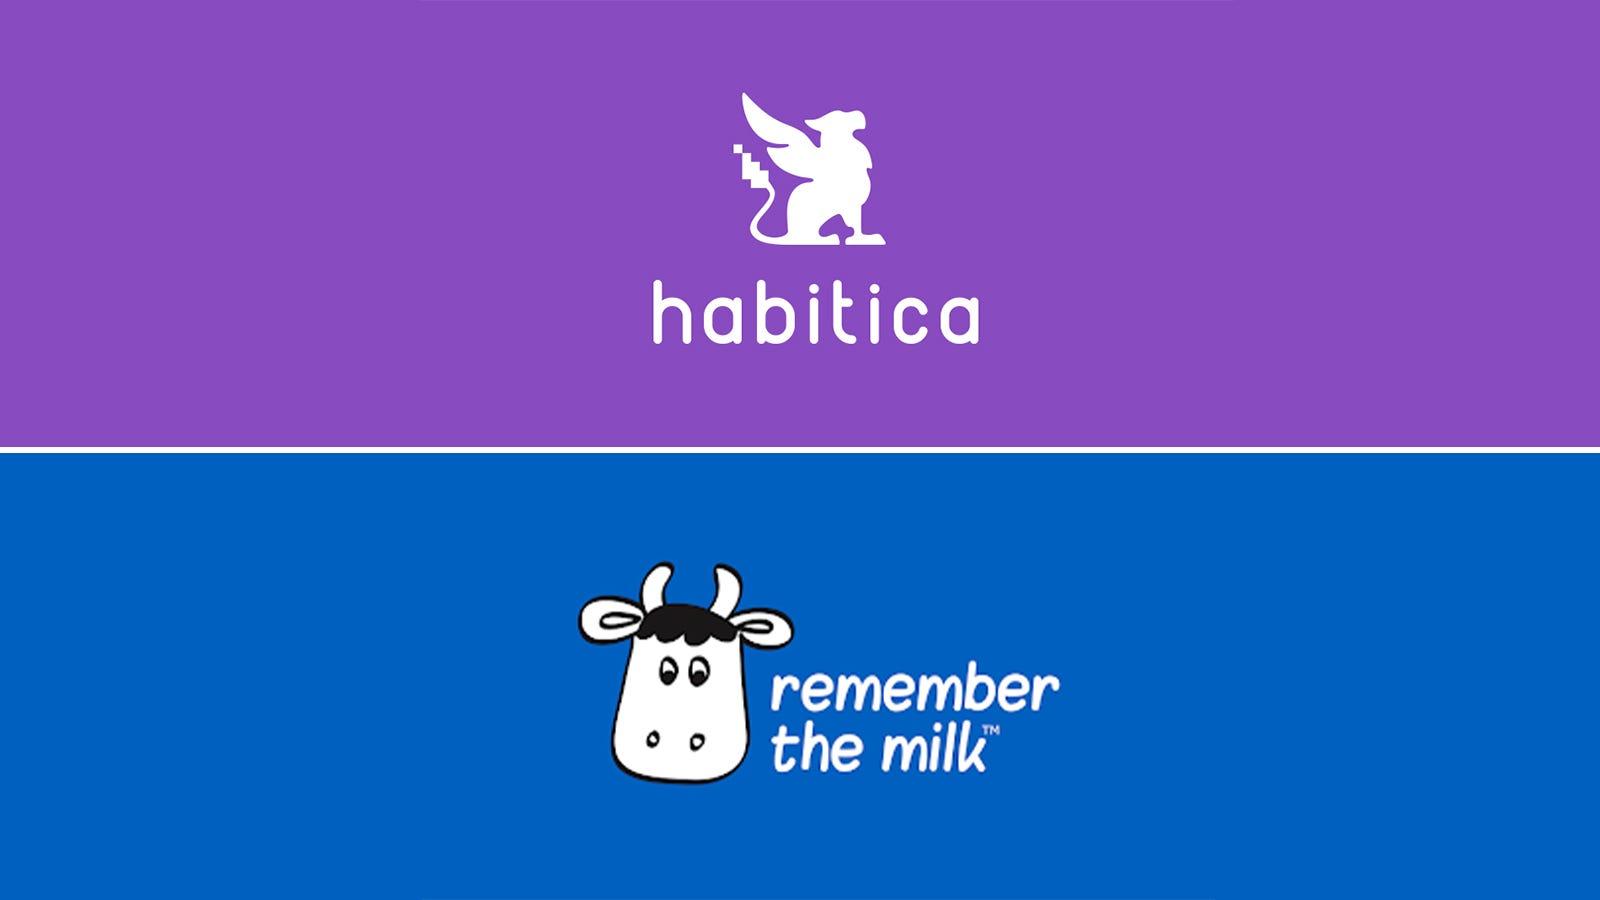 Habitica and Remember The Milk